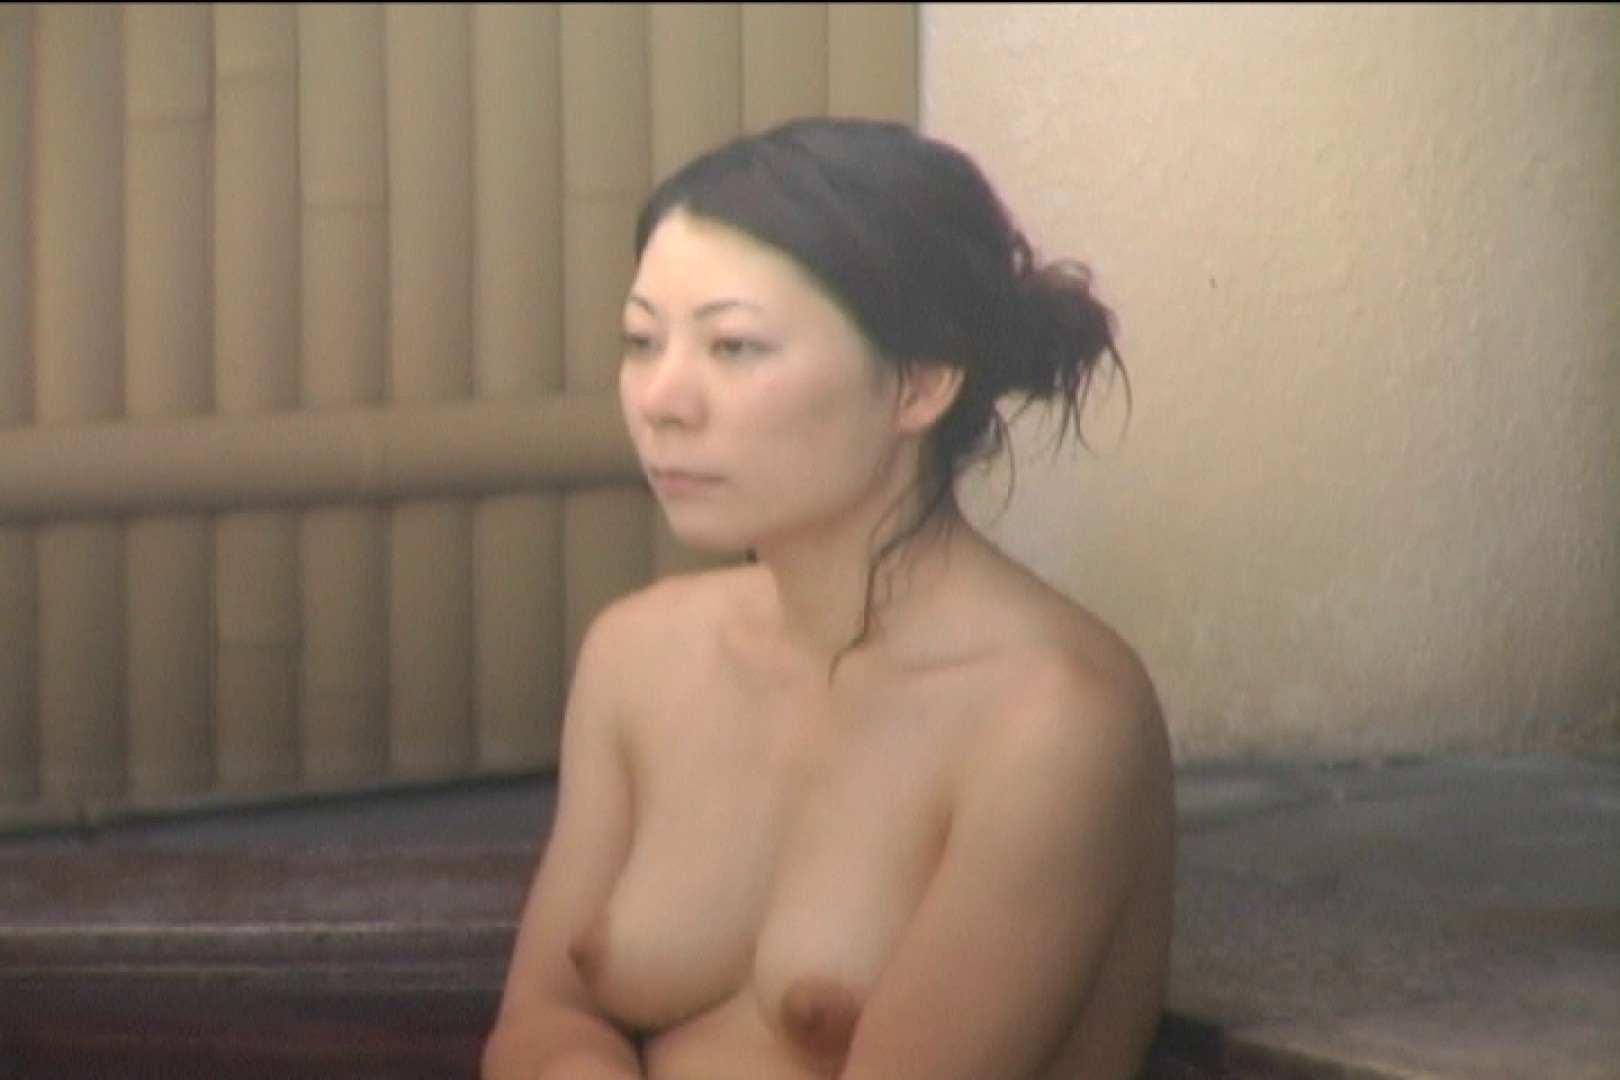 Aquaな露天風呂Vol.533 綺麗なOLたち オマンコ無修正動画無料 108枚 62